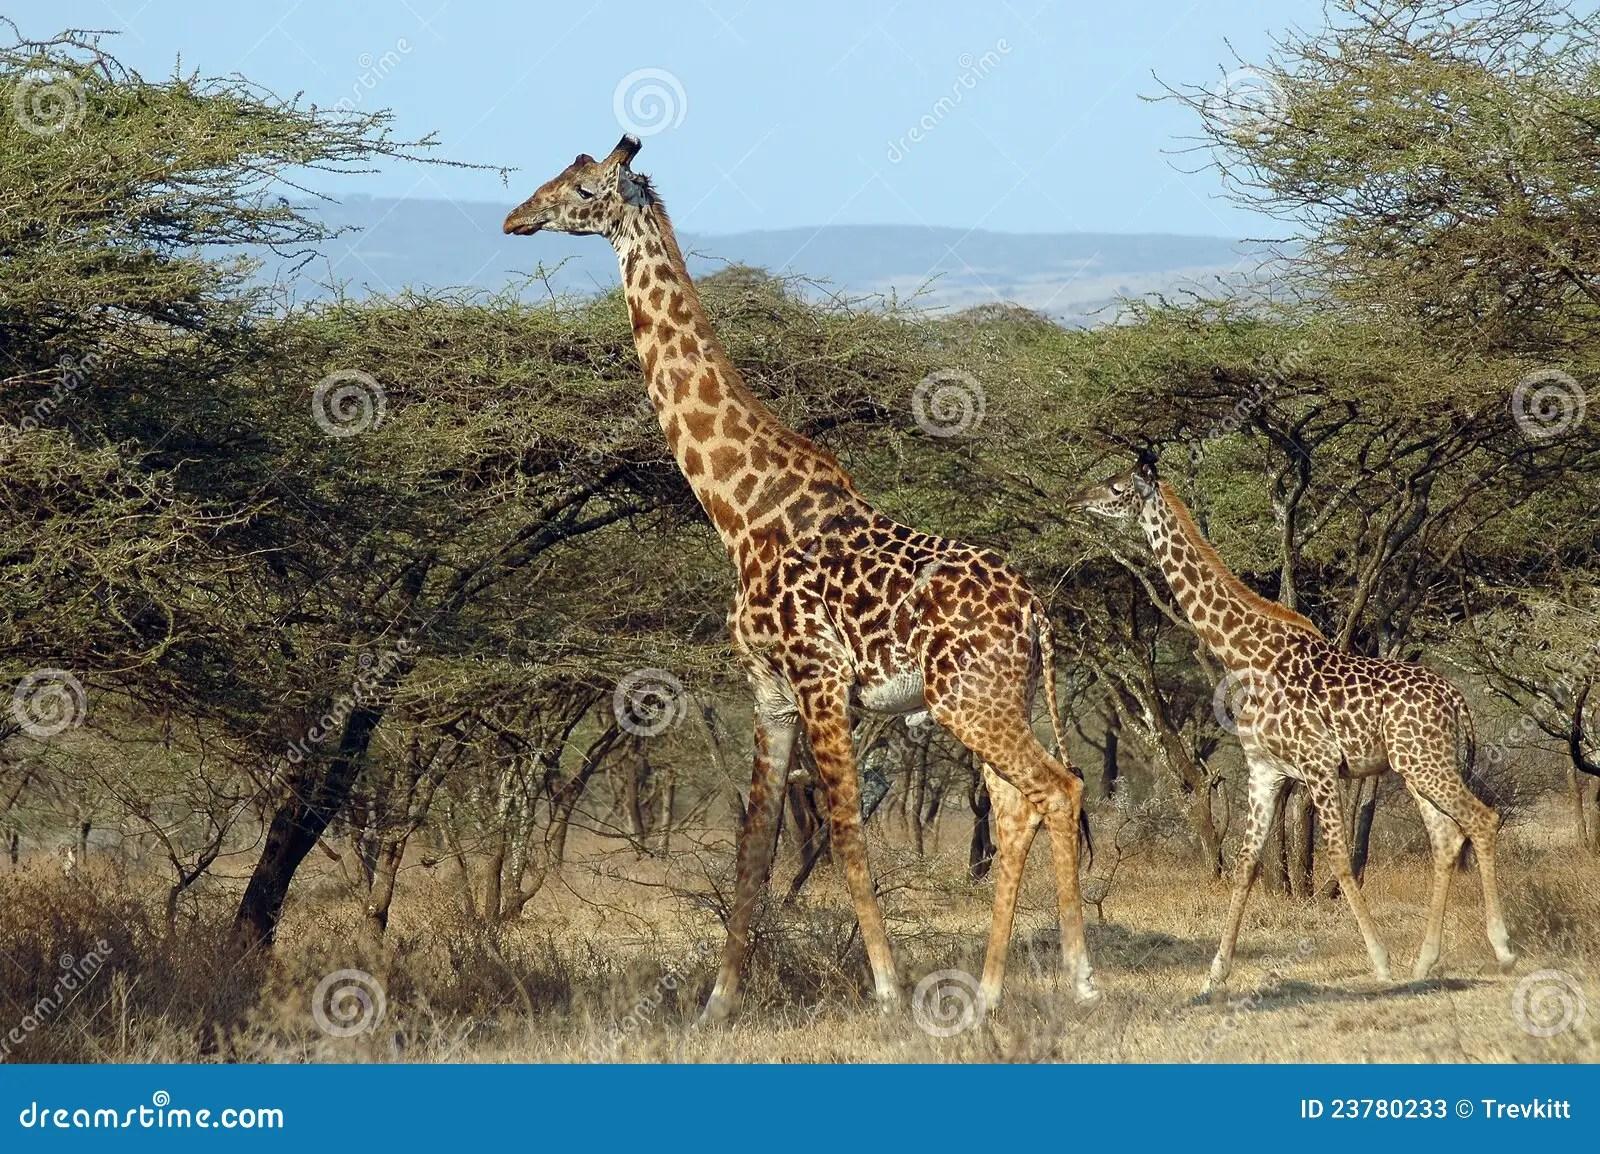 Mother And Baby Giraffe Amongst Acacia Trees Stock Image